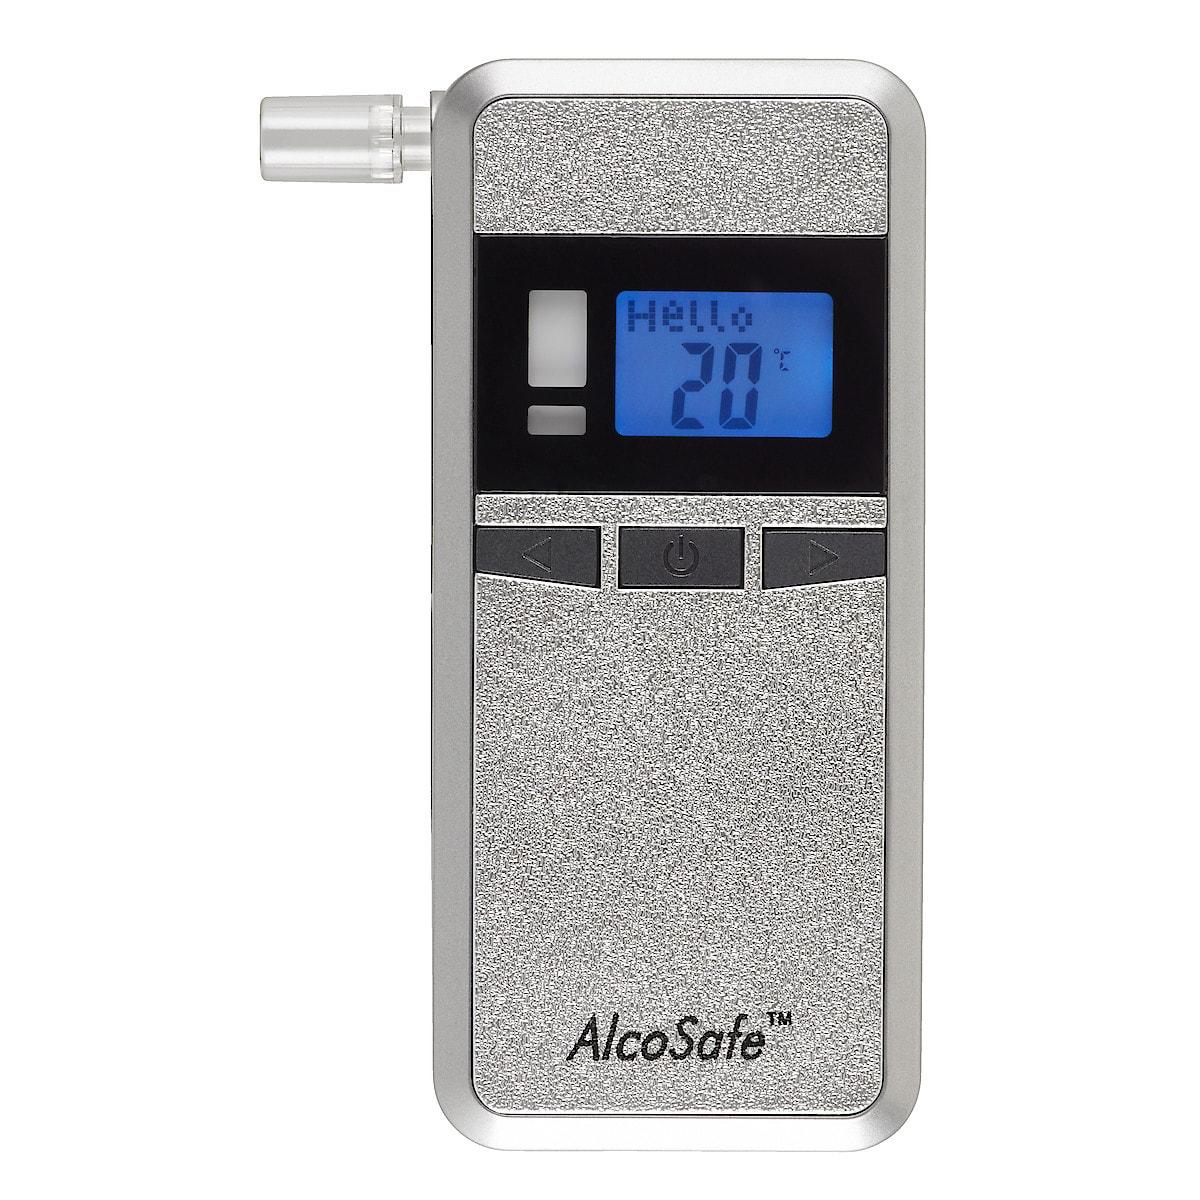 Alkometri Alcosafe kx6000S